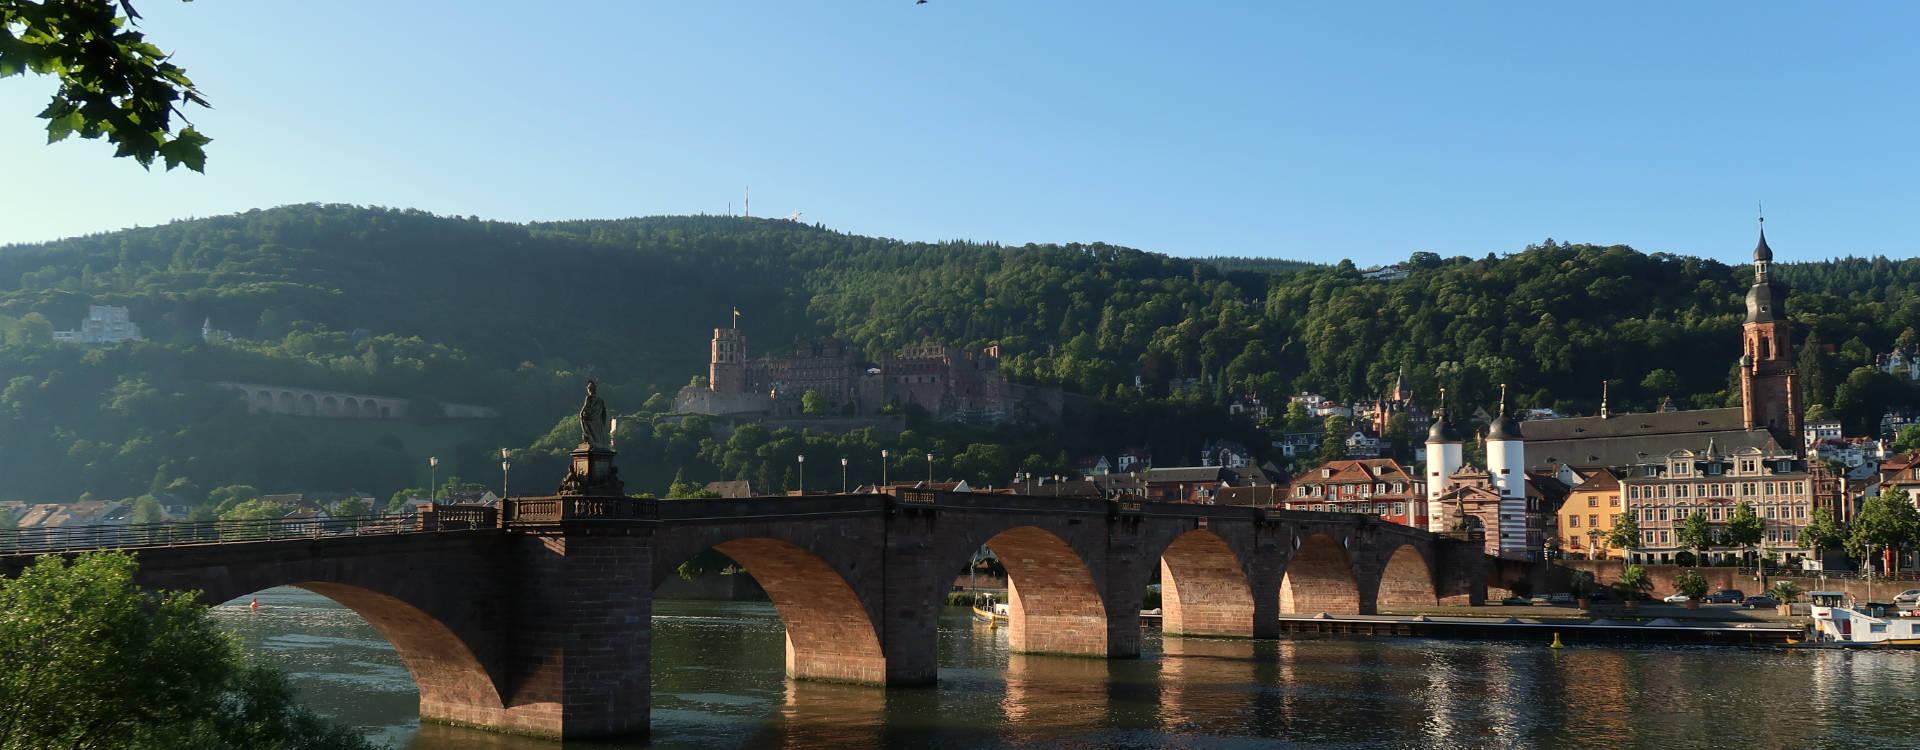 Heidelberg-Tipps